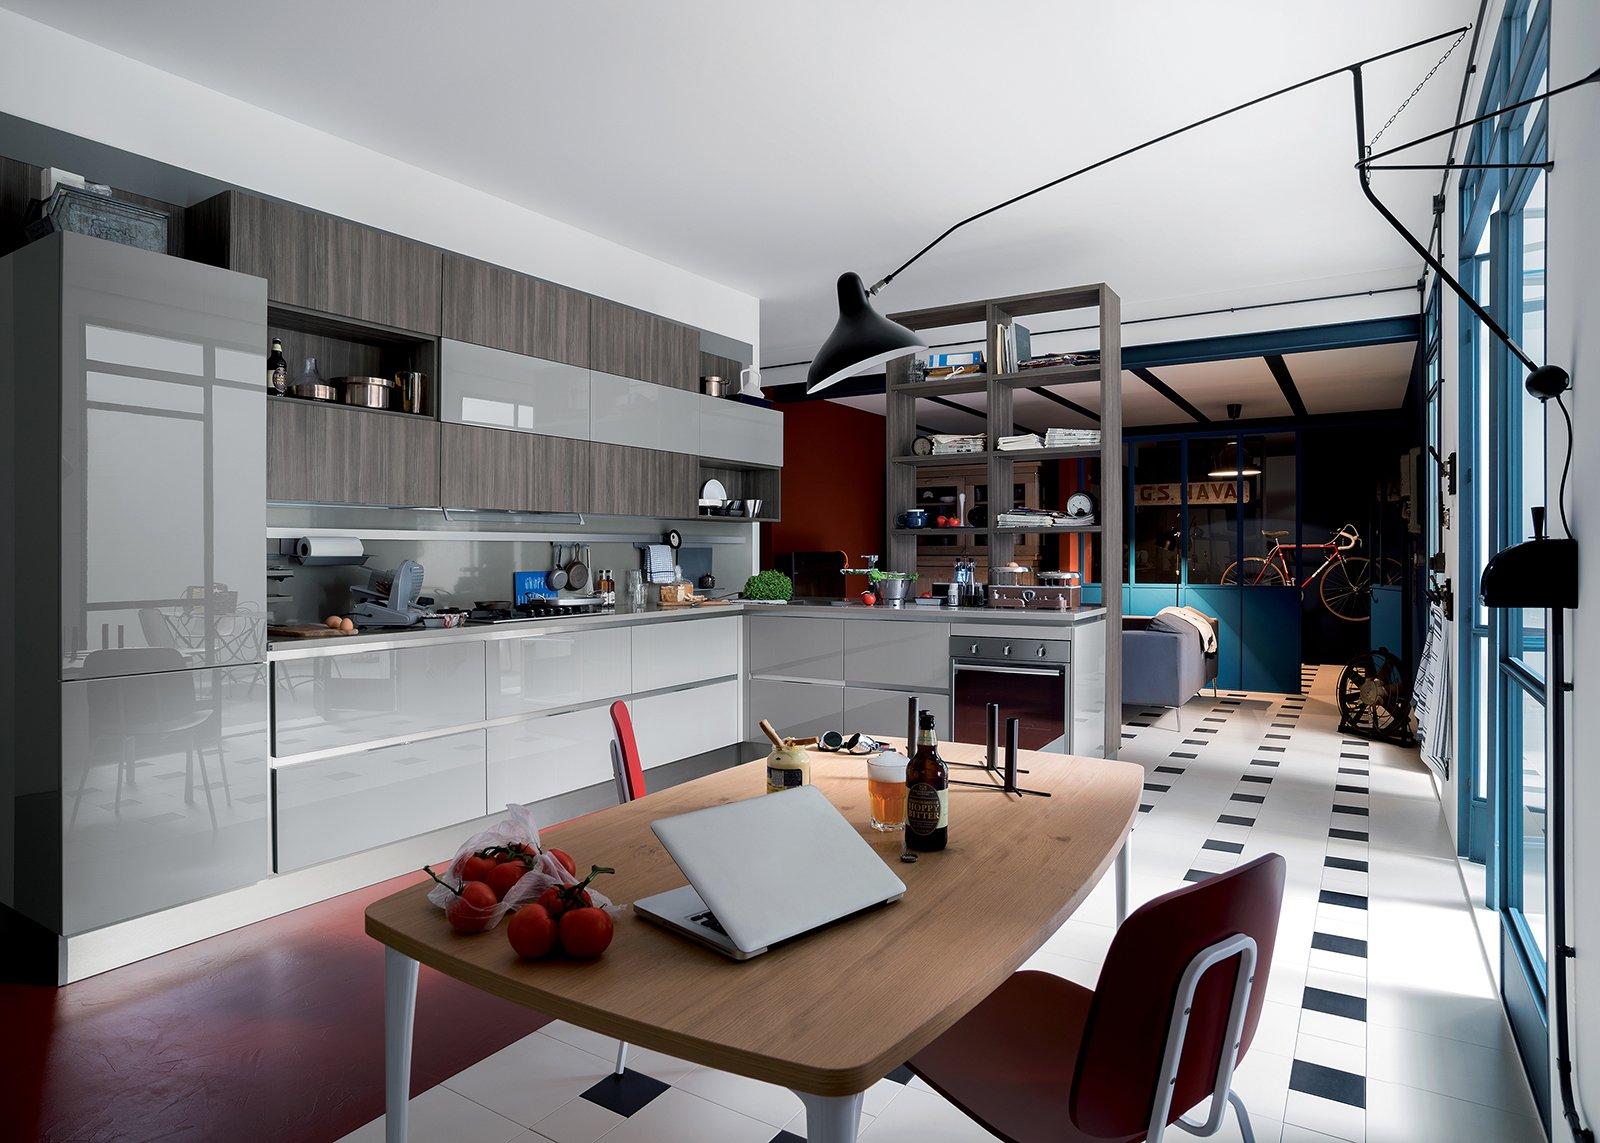 Cucine industrial style cose di casa for Cucine in stile